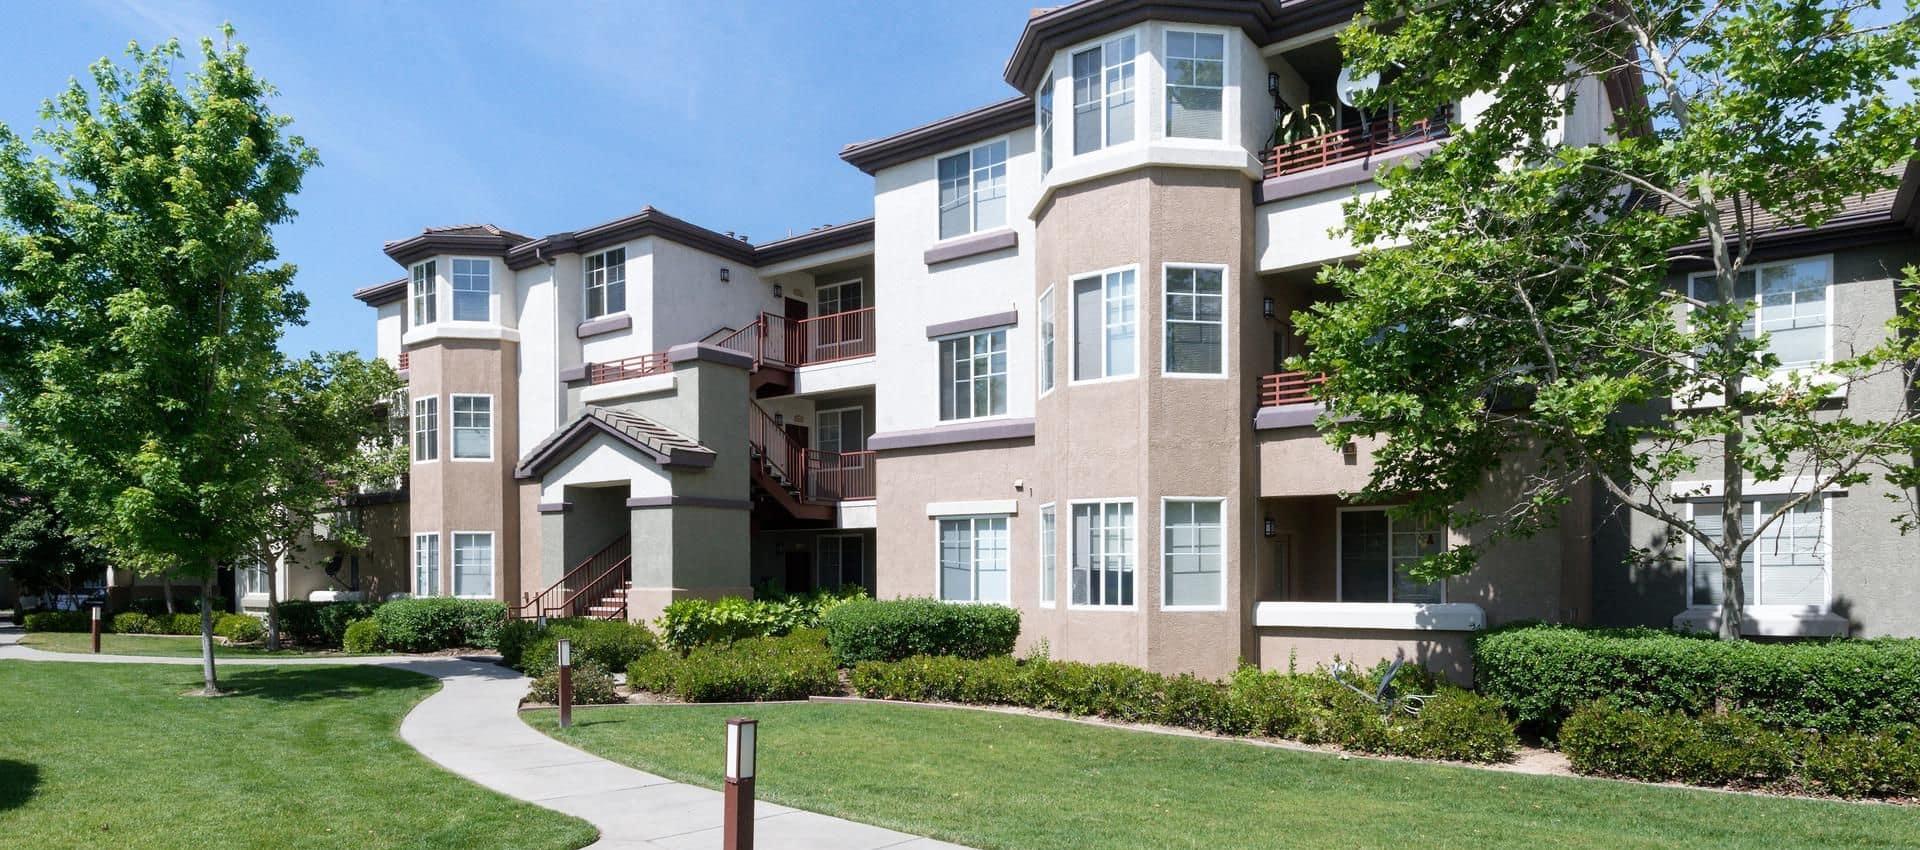 The Artisan Apartment Homes's Walking Path Through Apartments in Sacramento, CA